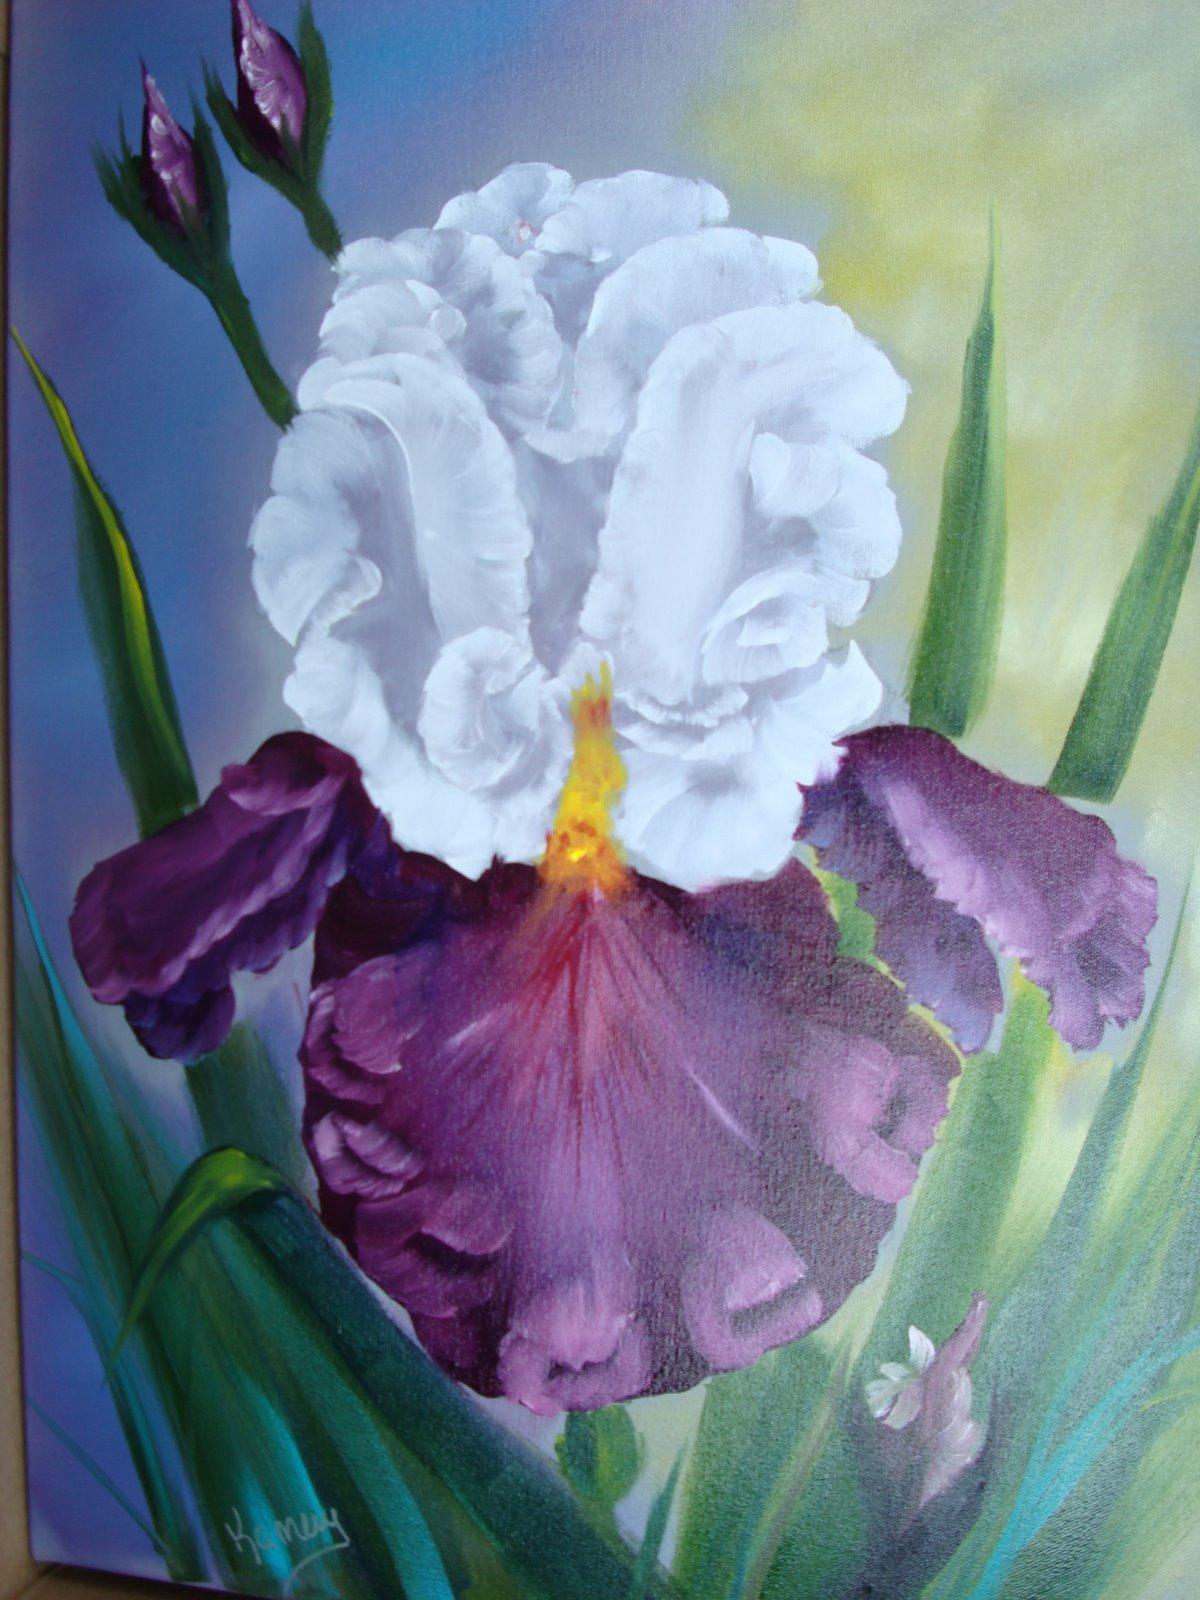 FL 1004 The Iris 18 x 24